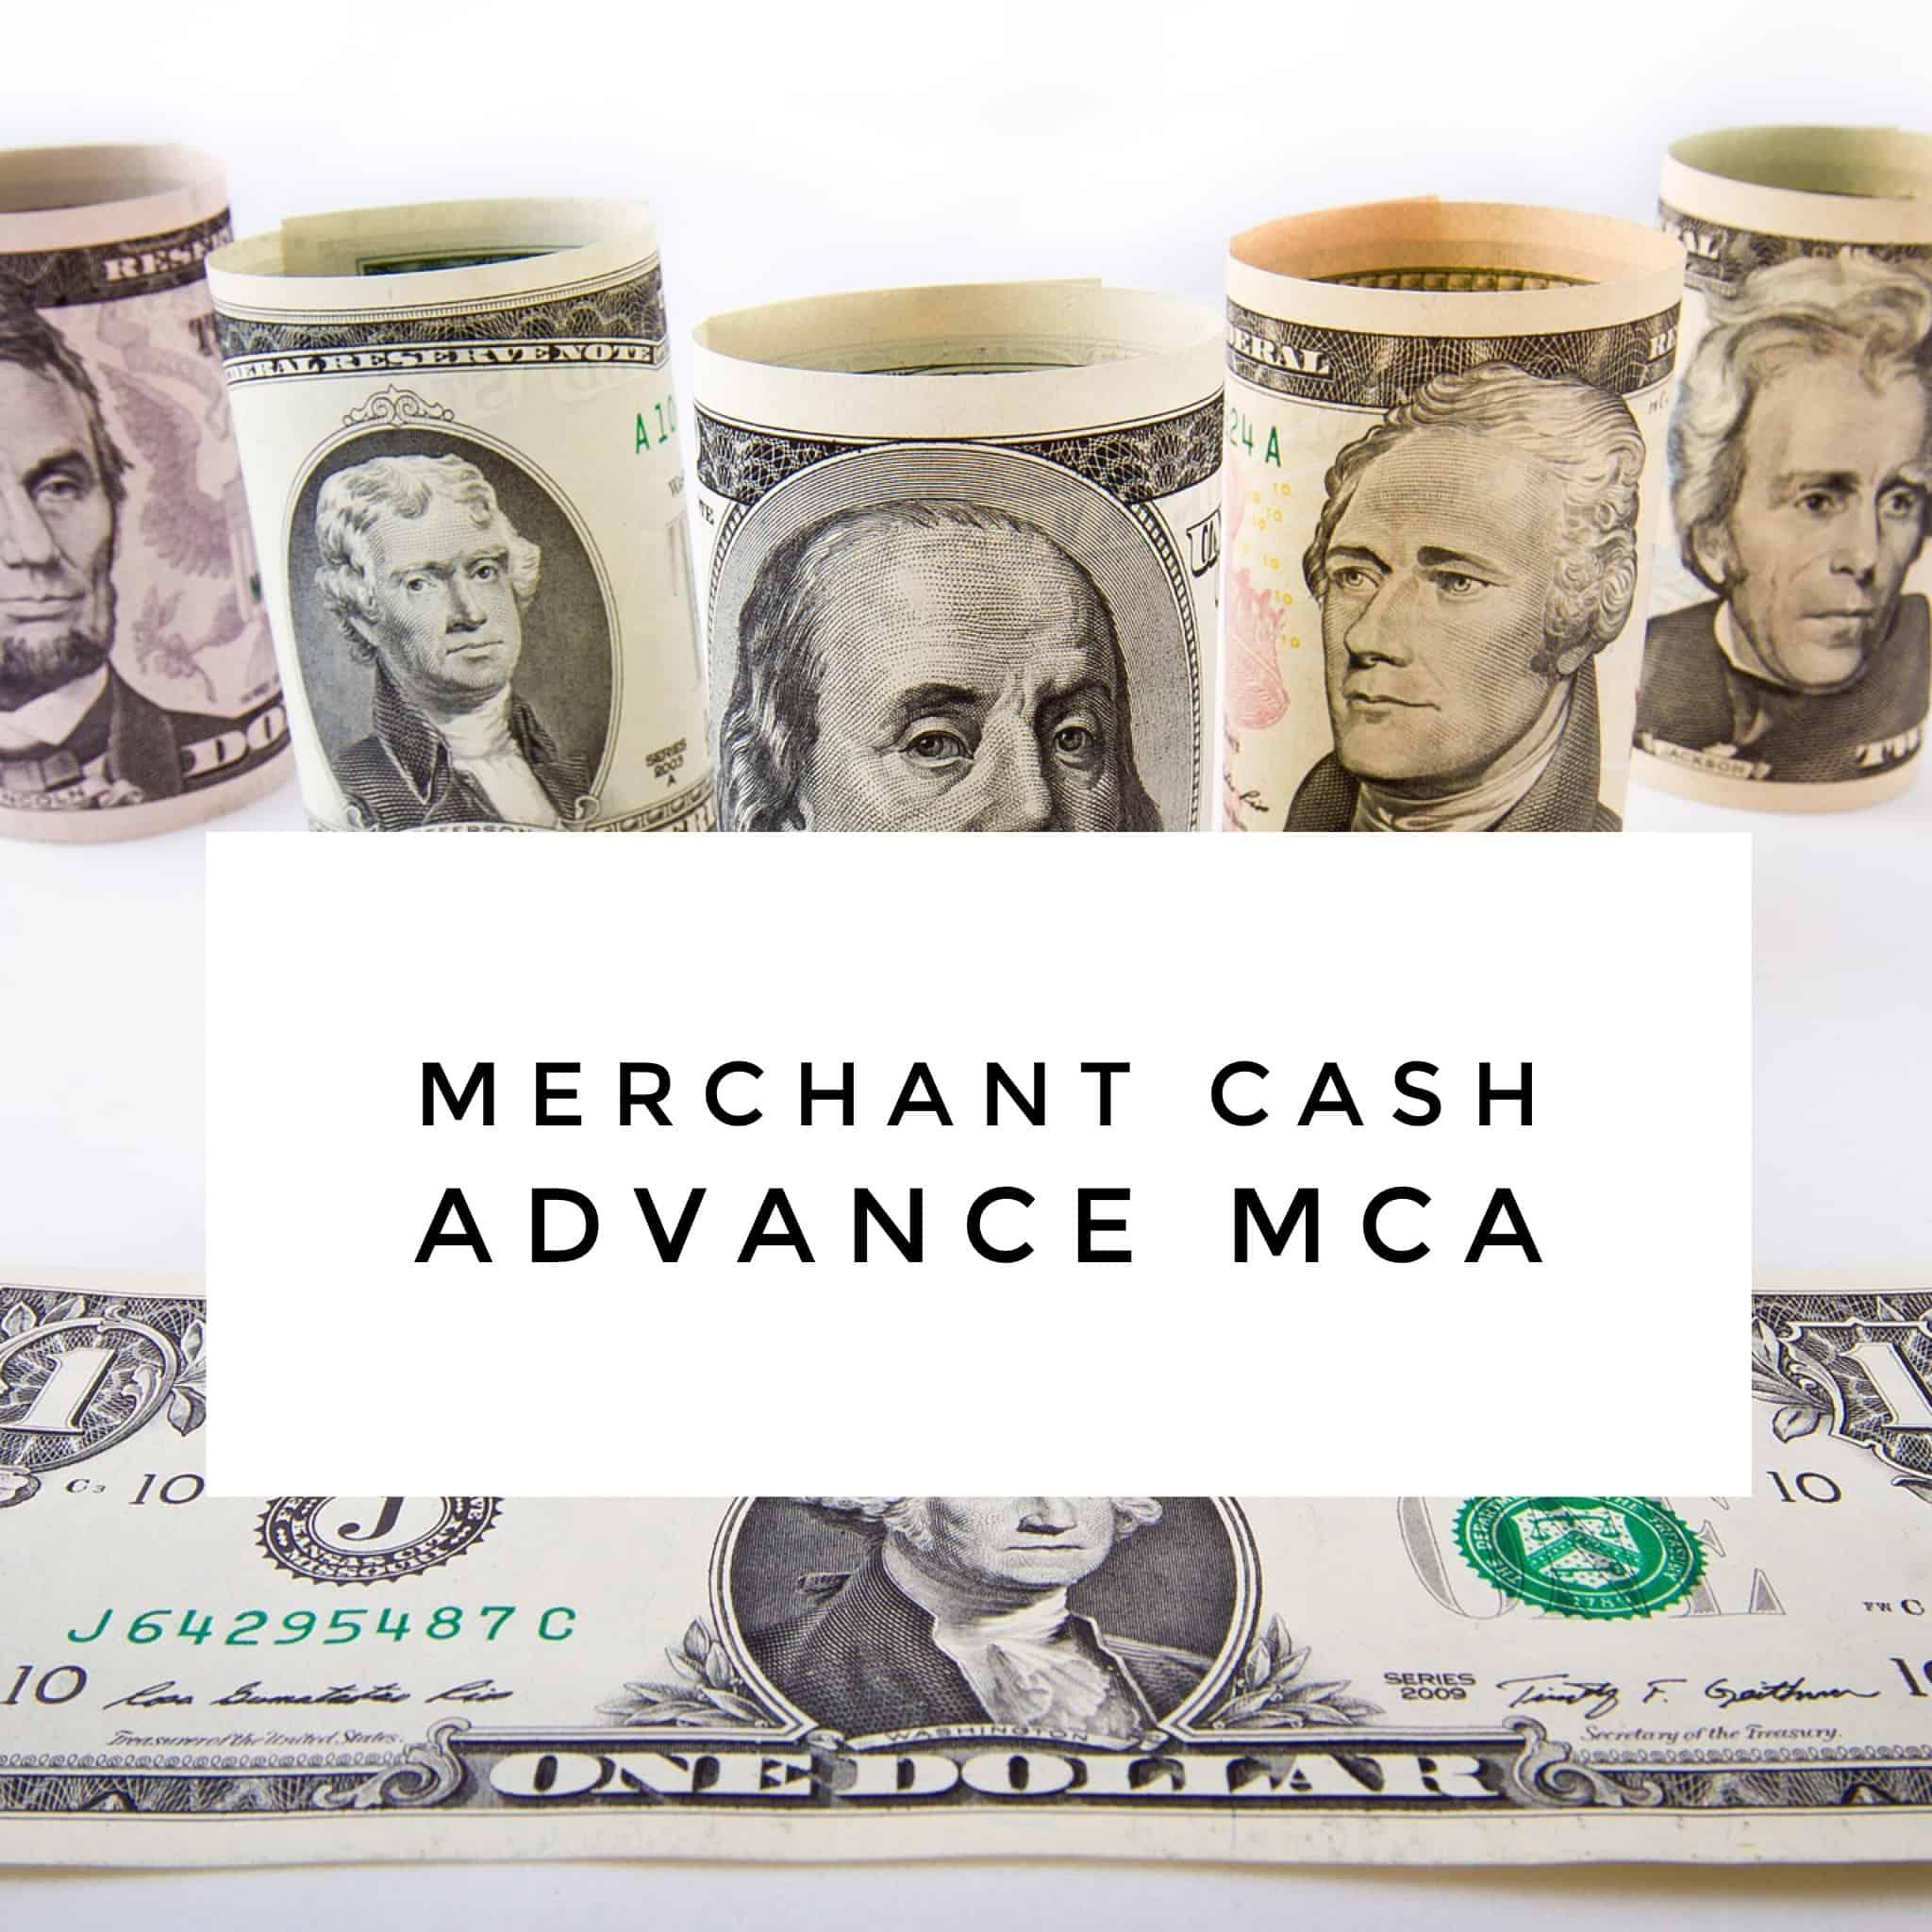 Merchant Cash Advance MCA